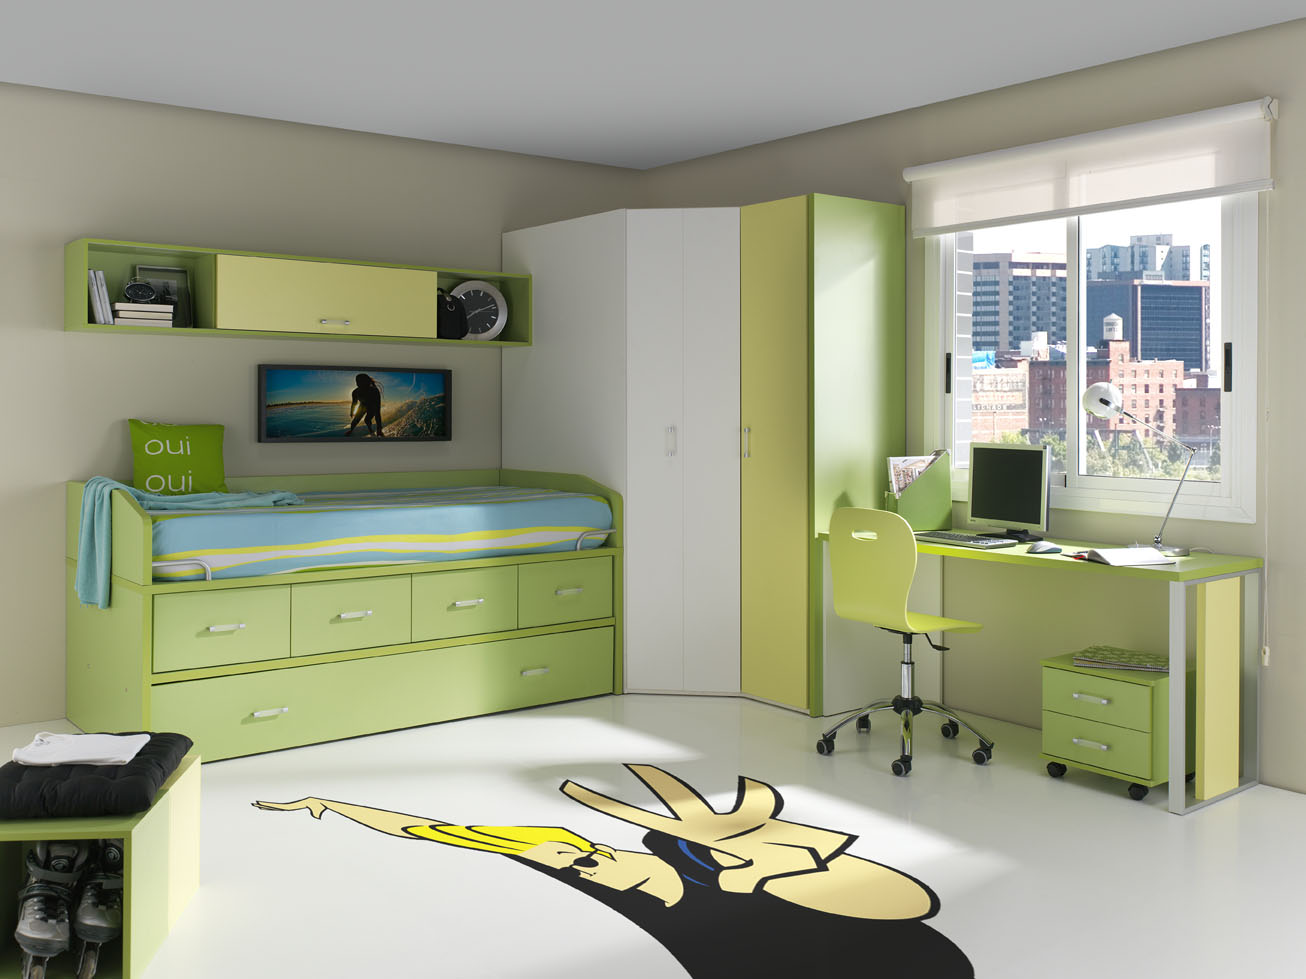 Ambientes juveniles muebles orts blog - Muebles dormitorio juvenil ...